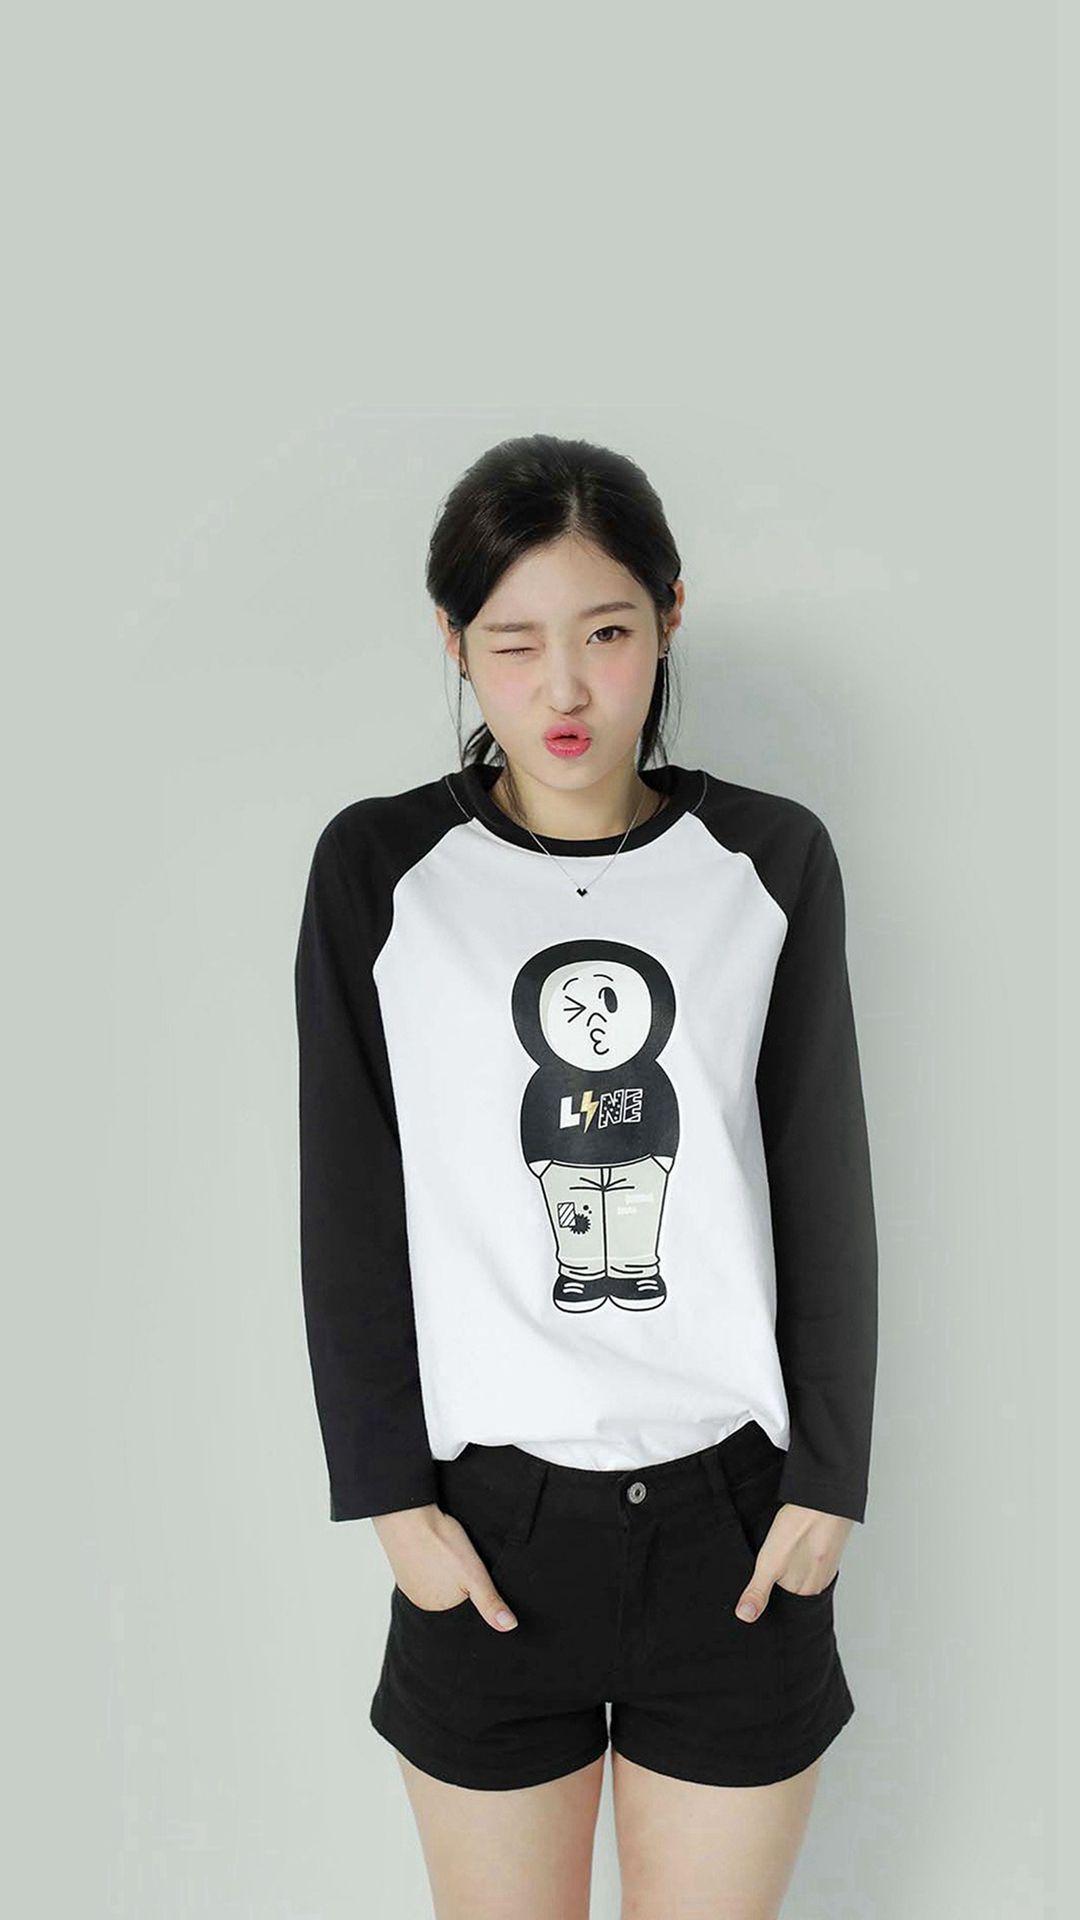 Kpop IOI Chayeon Girl Cute Wink iPhone 7 wallpaper iPhone 68 1080x1920